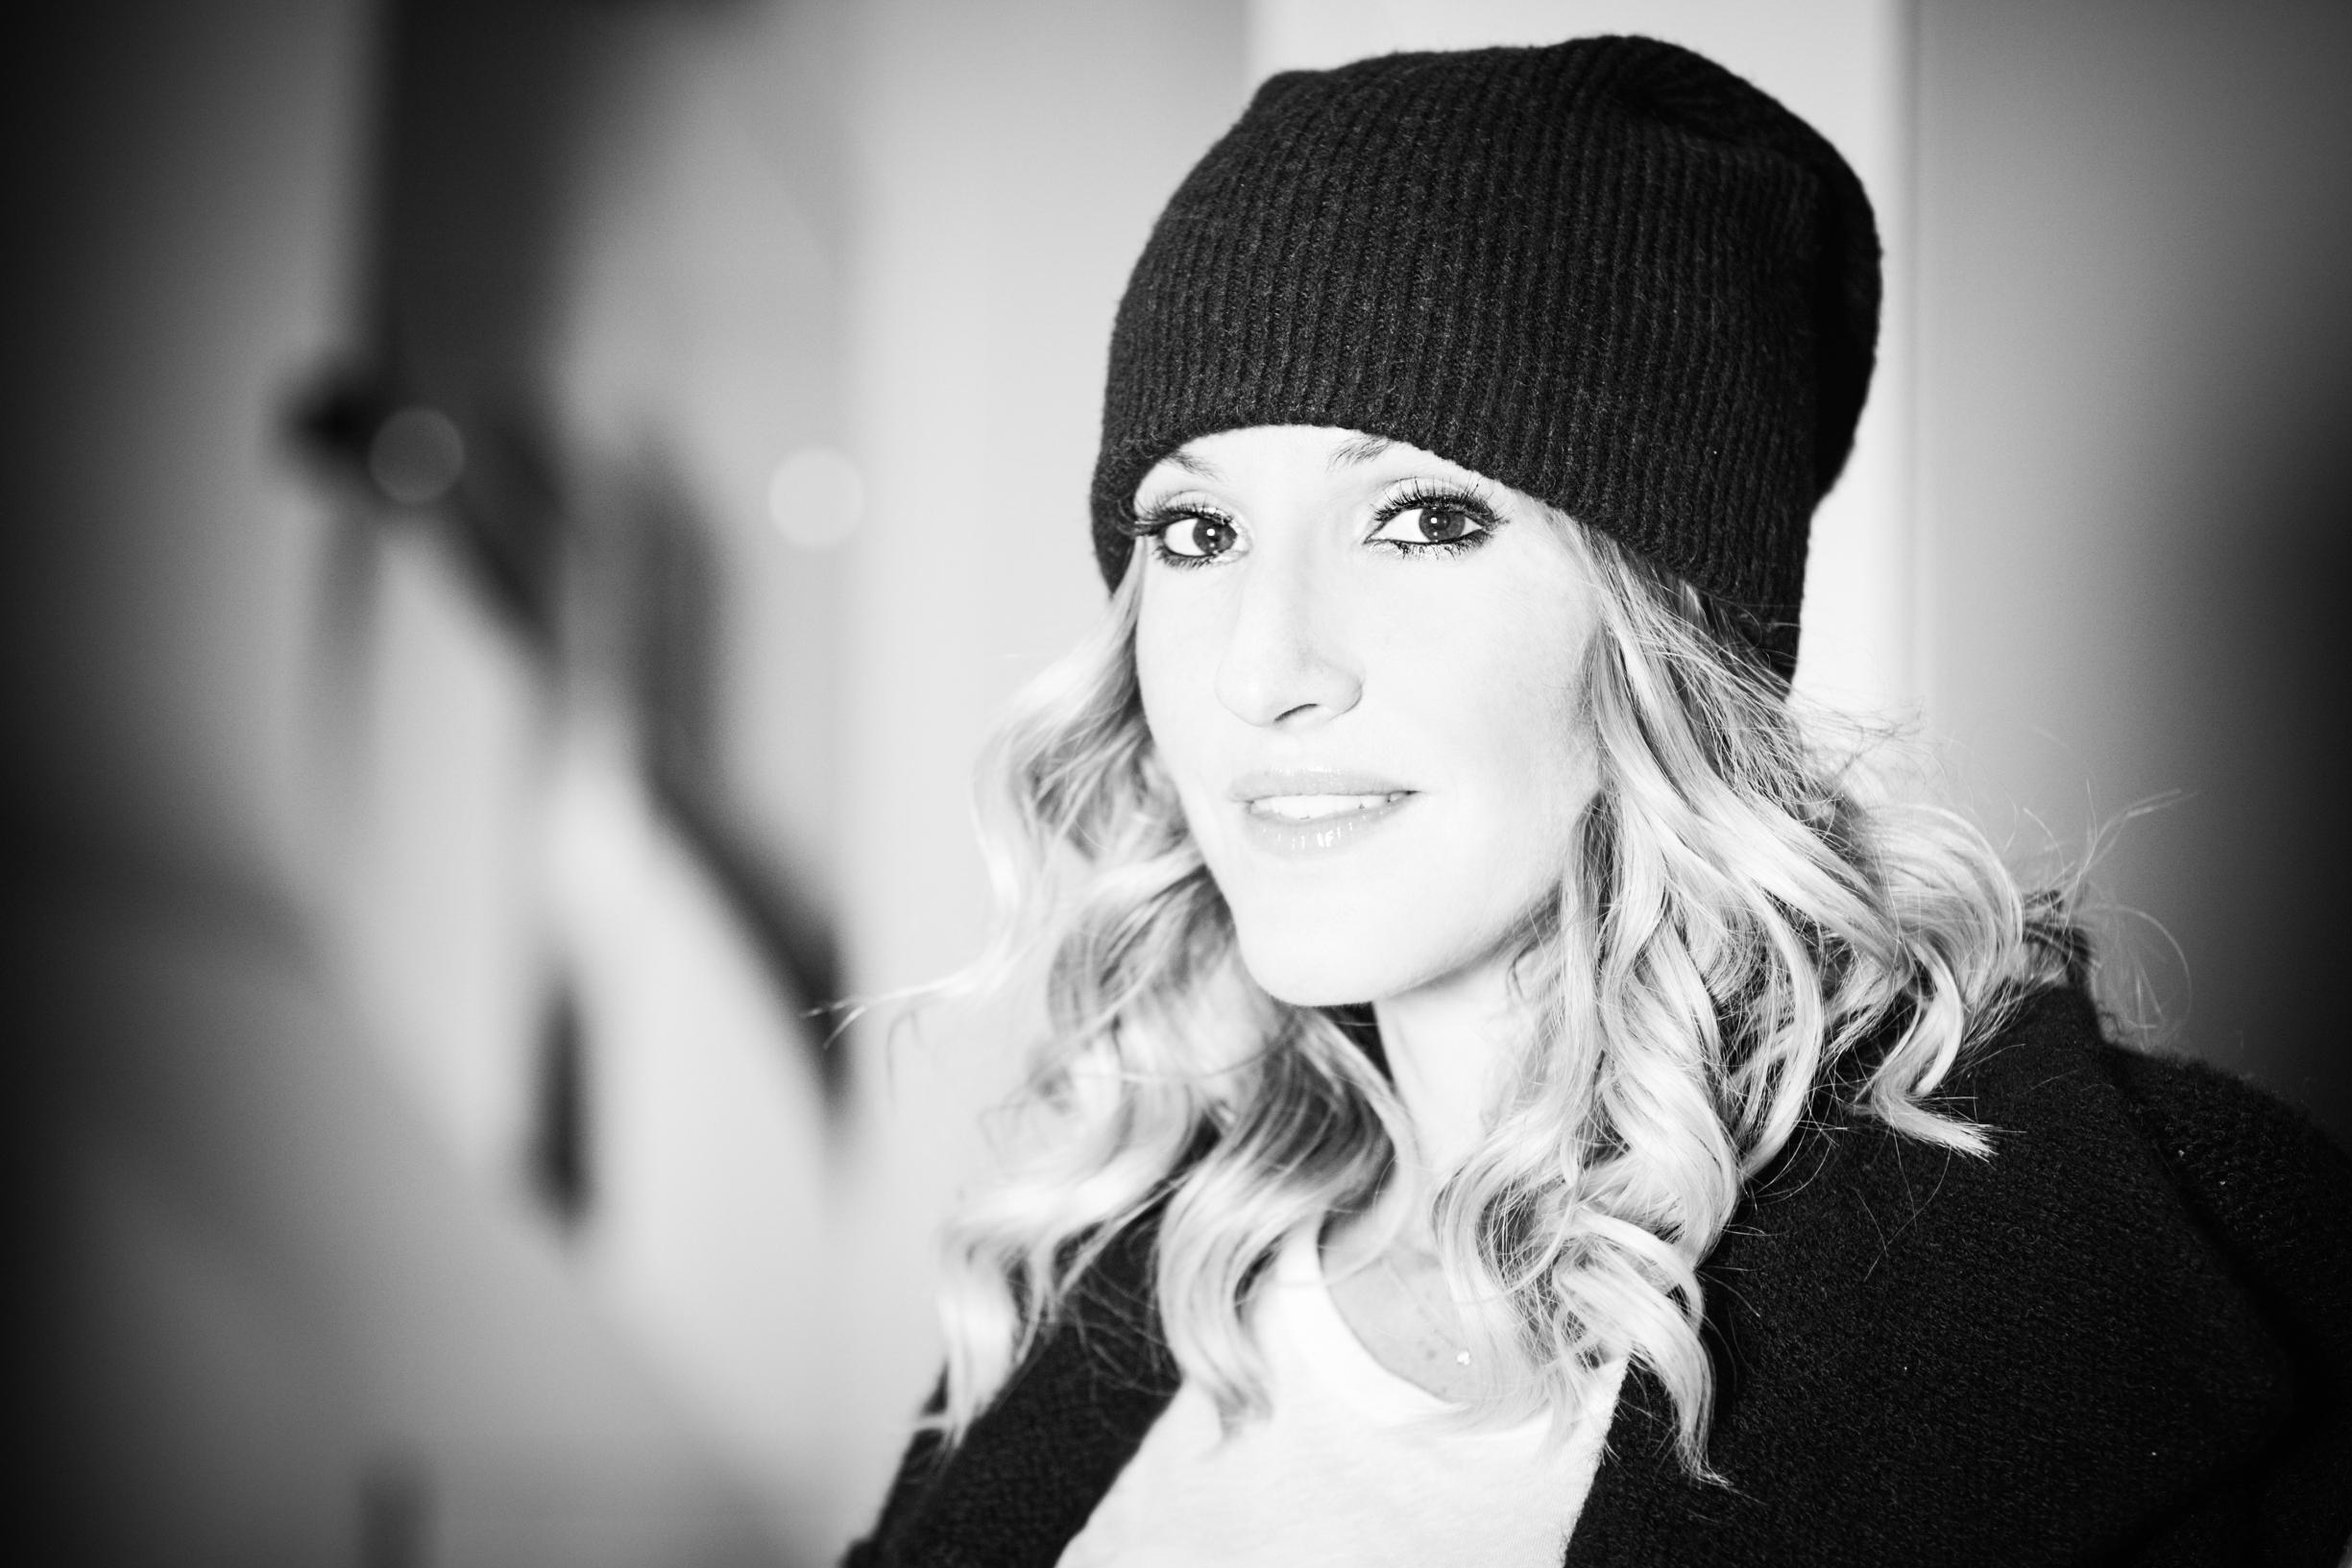 mademoiselle jules mlle lifestyle blog blogger fashion